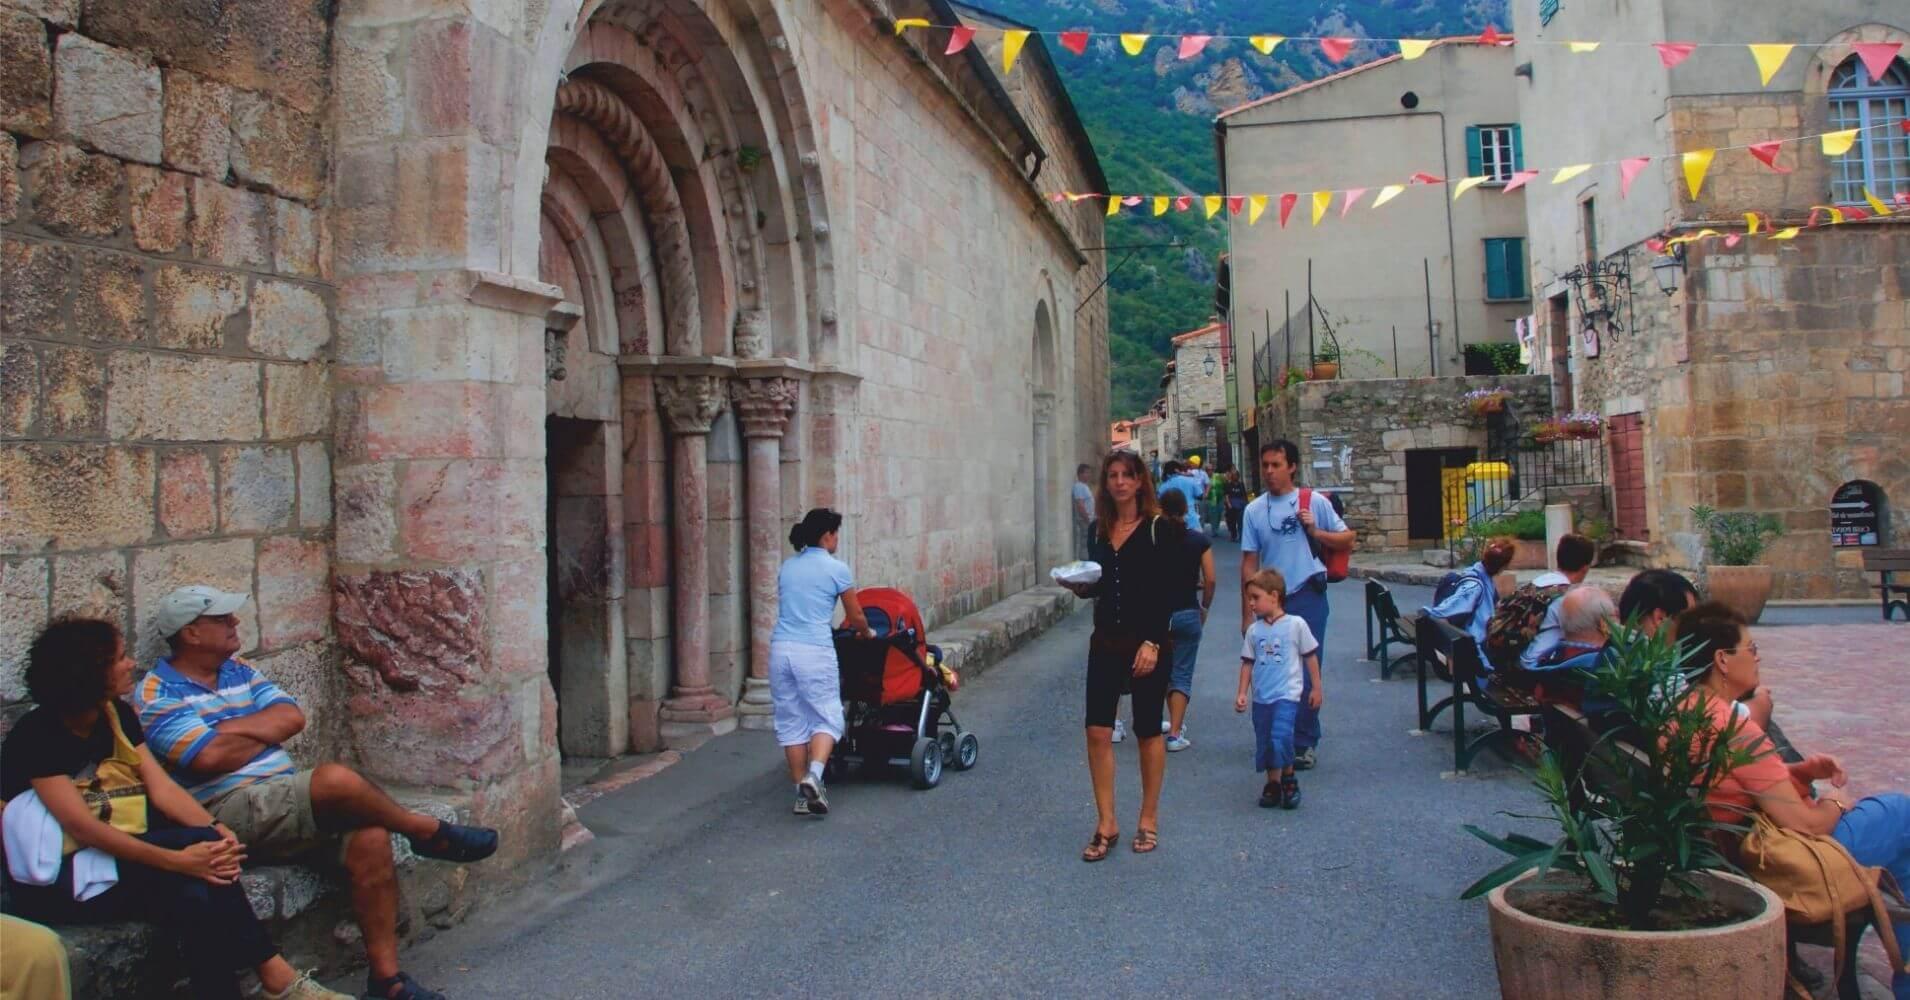 Iglesia de la Villa. Languedoc-Rosellón. Pirineos Orientales, Occitania, Francia.